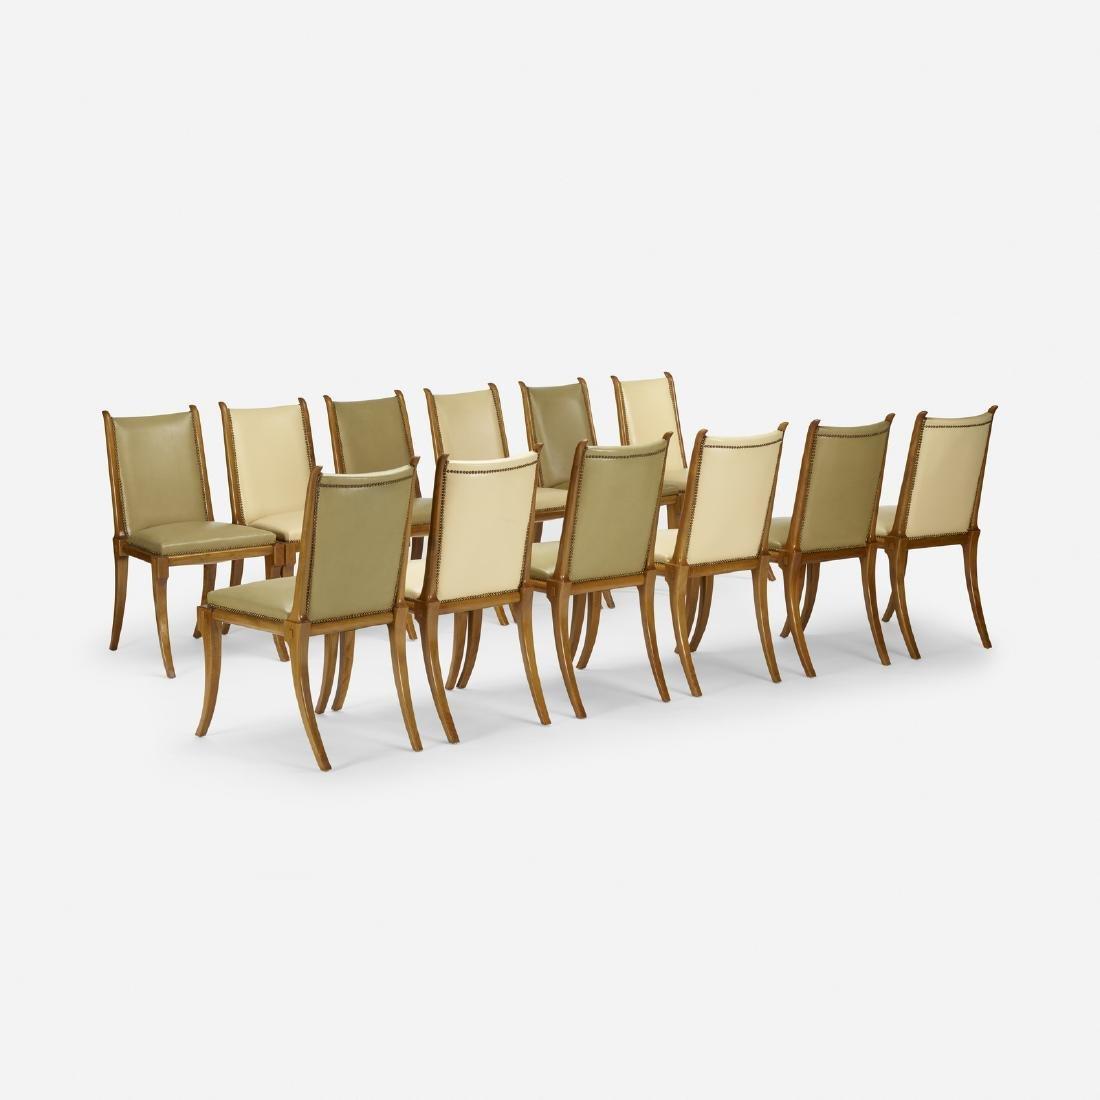 T.H. Robsjohn-Gibbings, dining chairs model no. 105